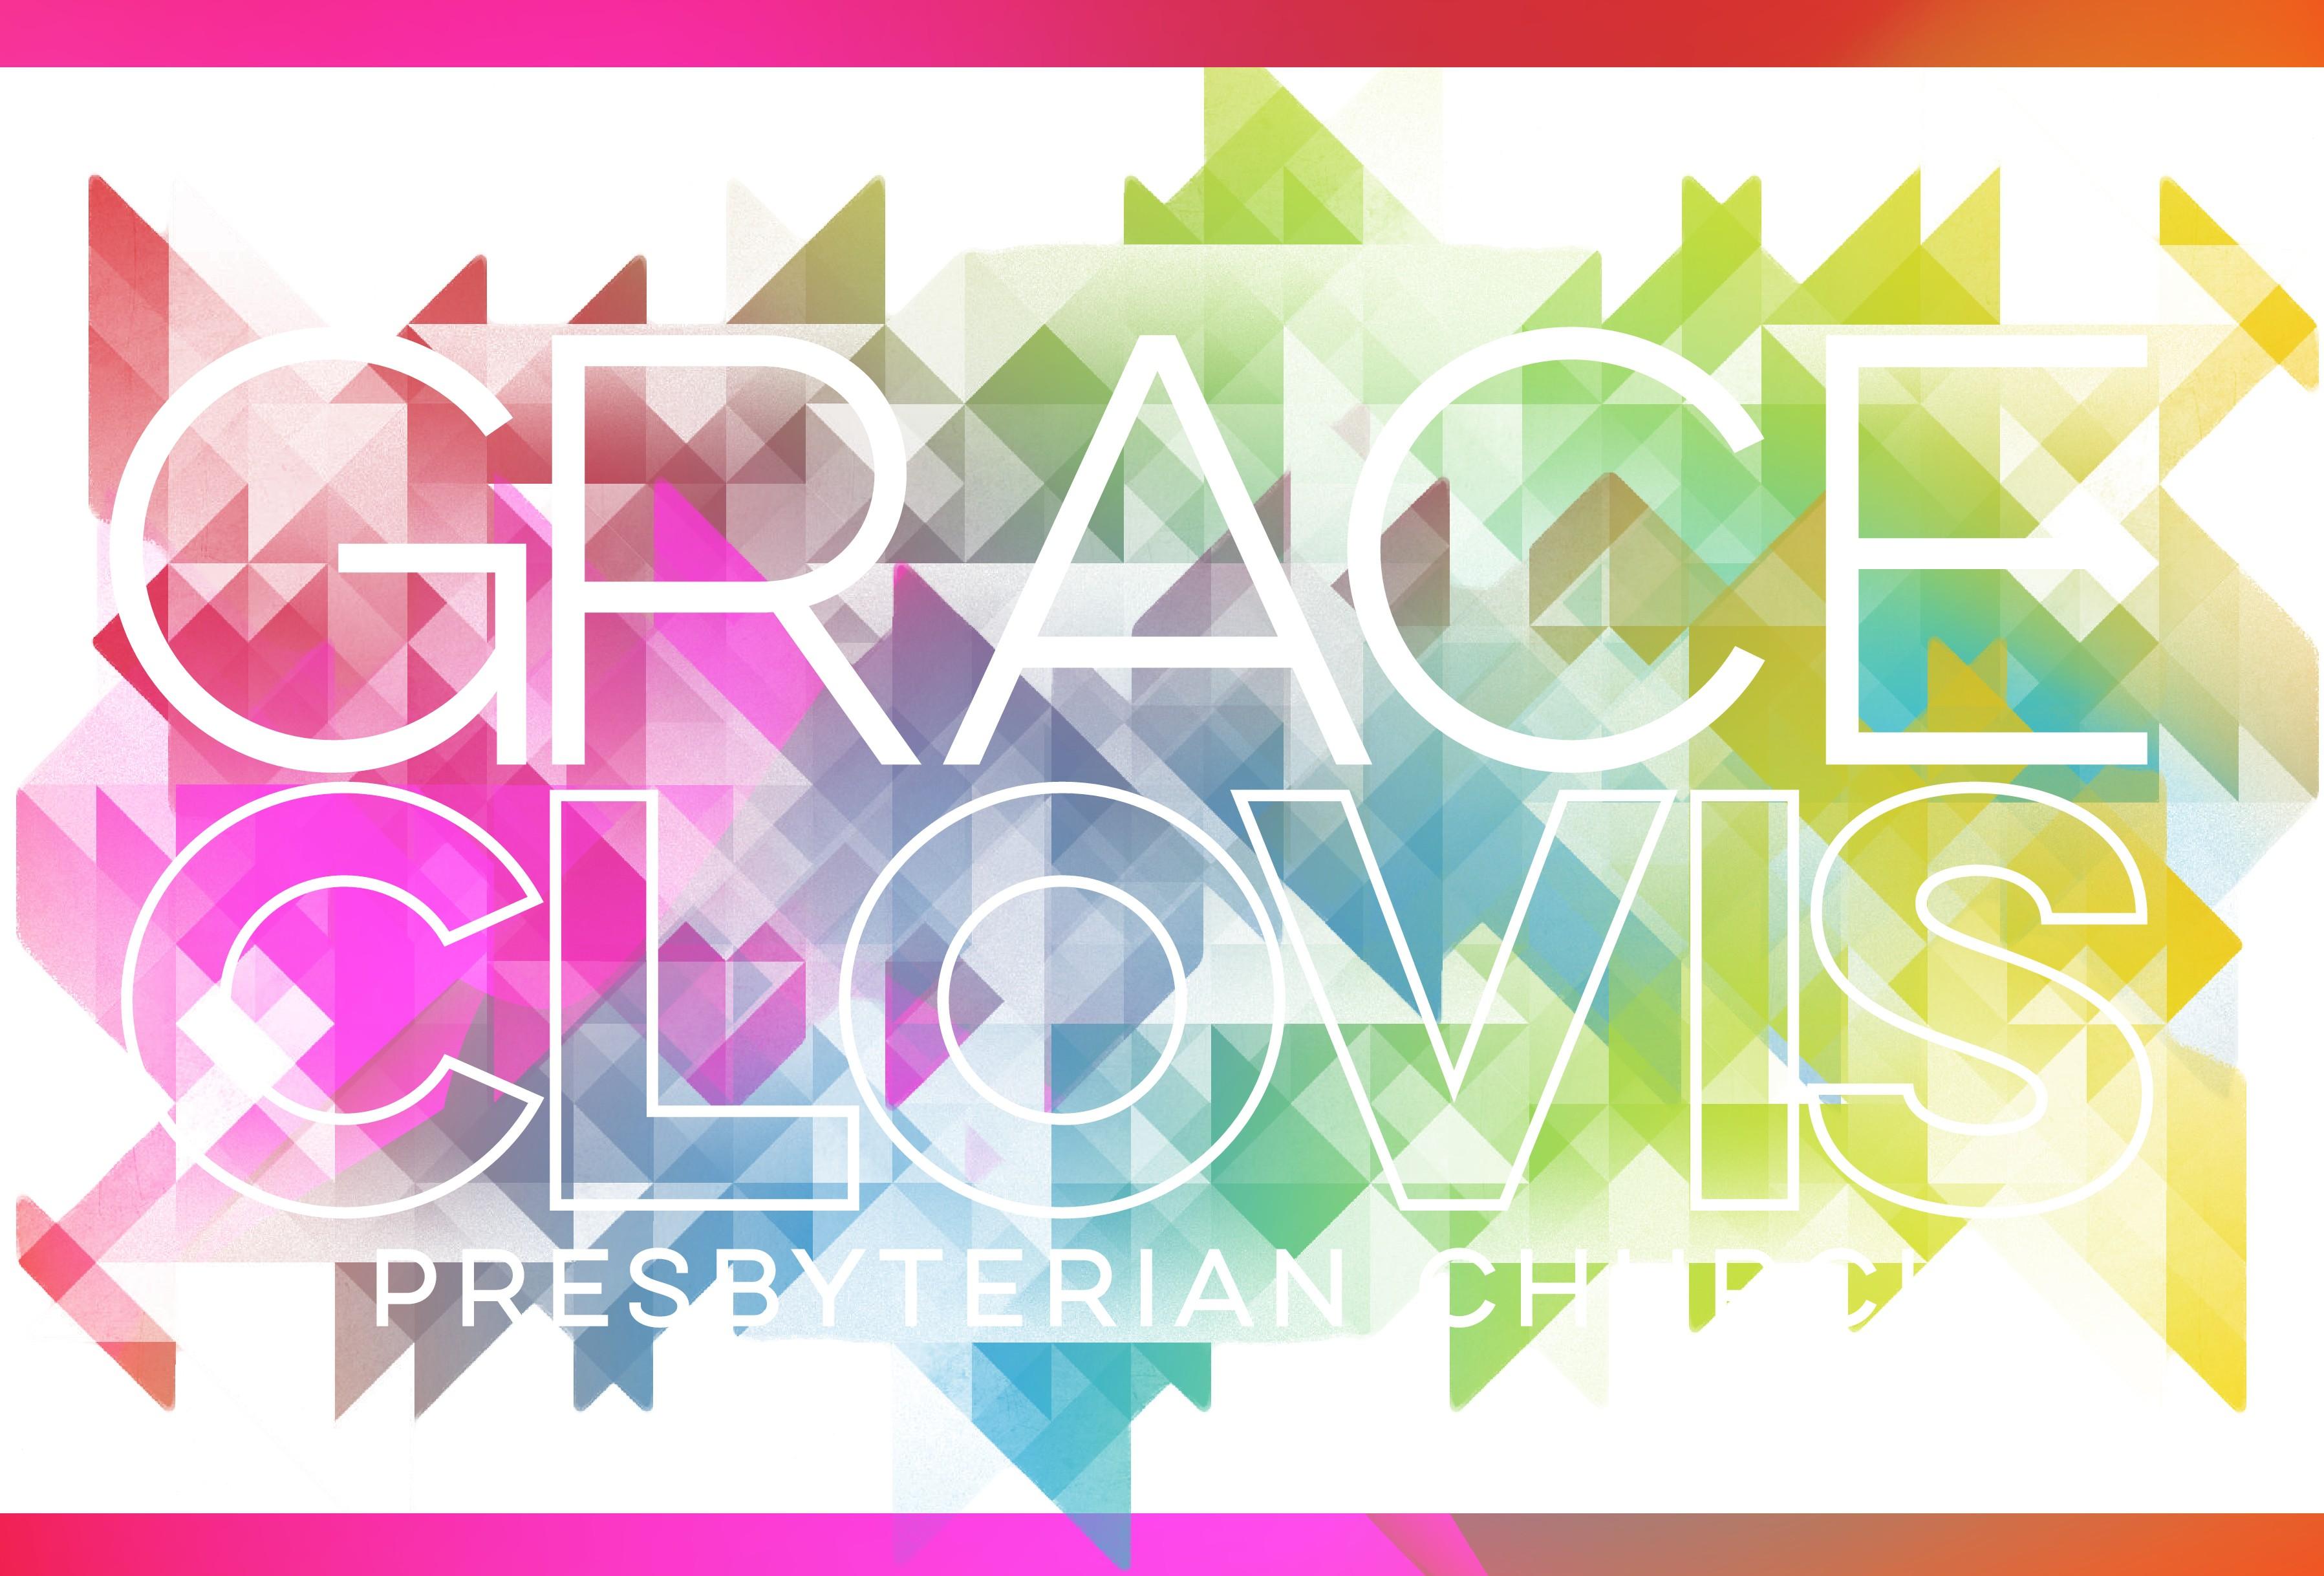 Grace Clovis Church is looking for a creative new t-shirt design